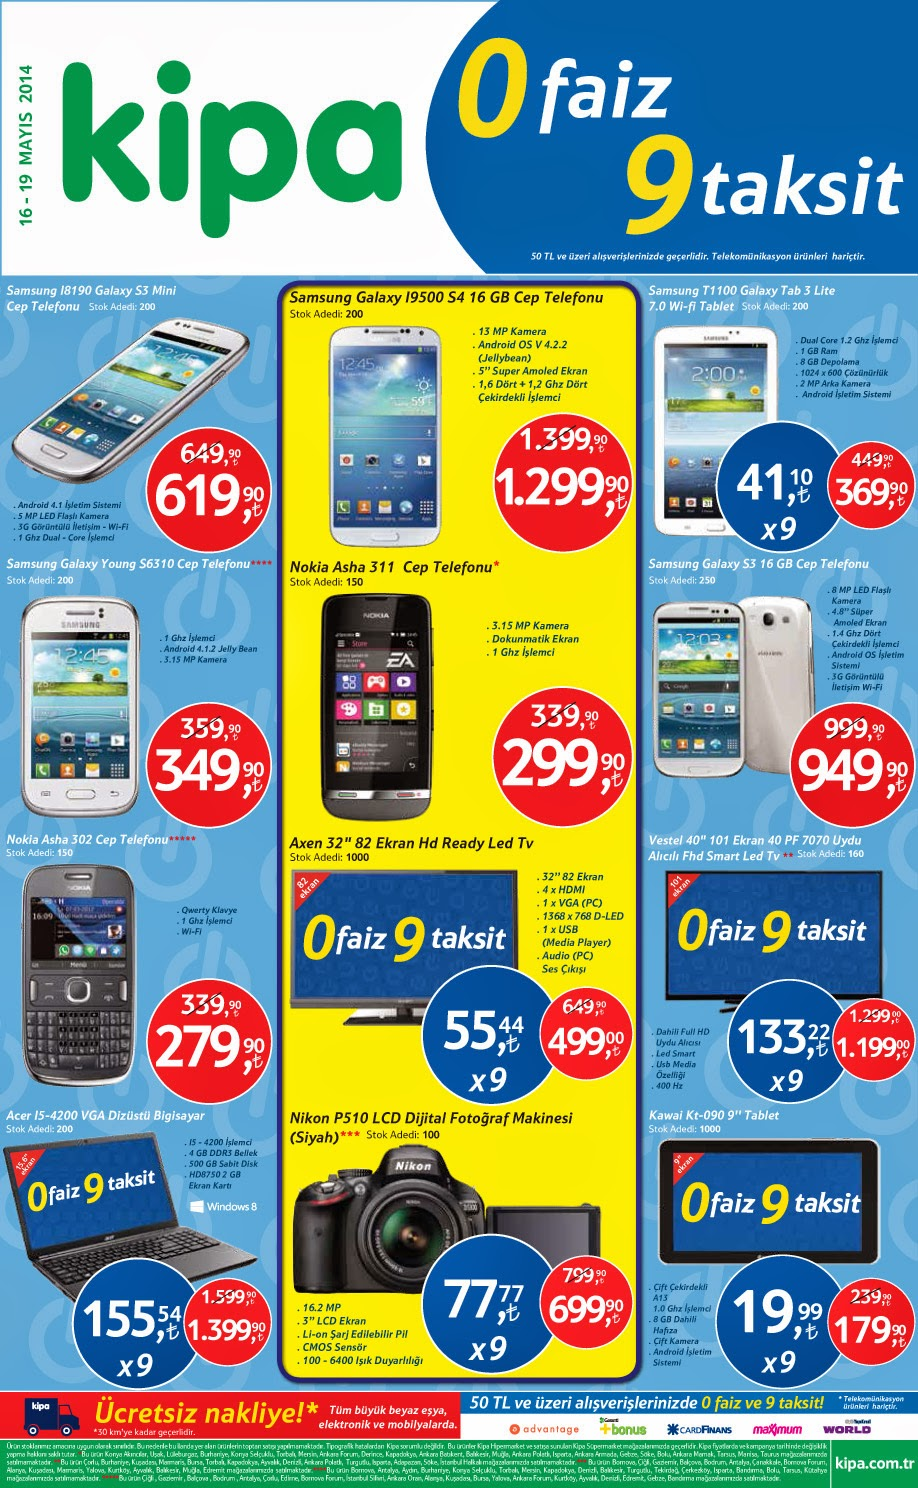 http://www.aktuelurunler.com/p/kipa-market-16-19-mays-elektronik.html